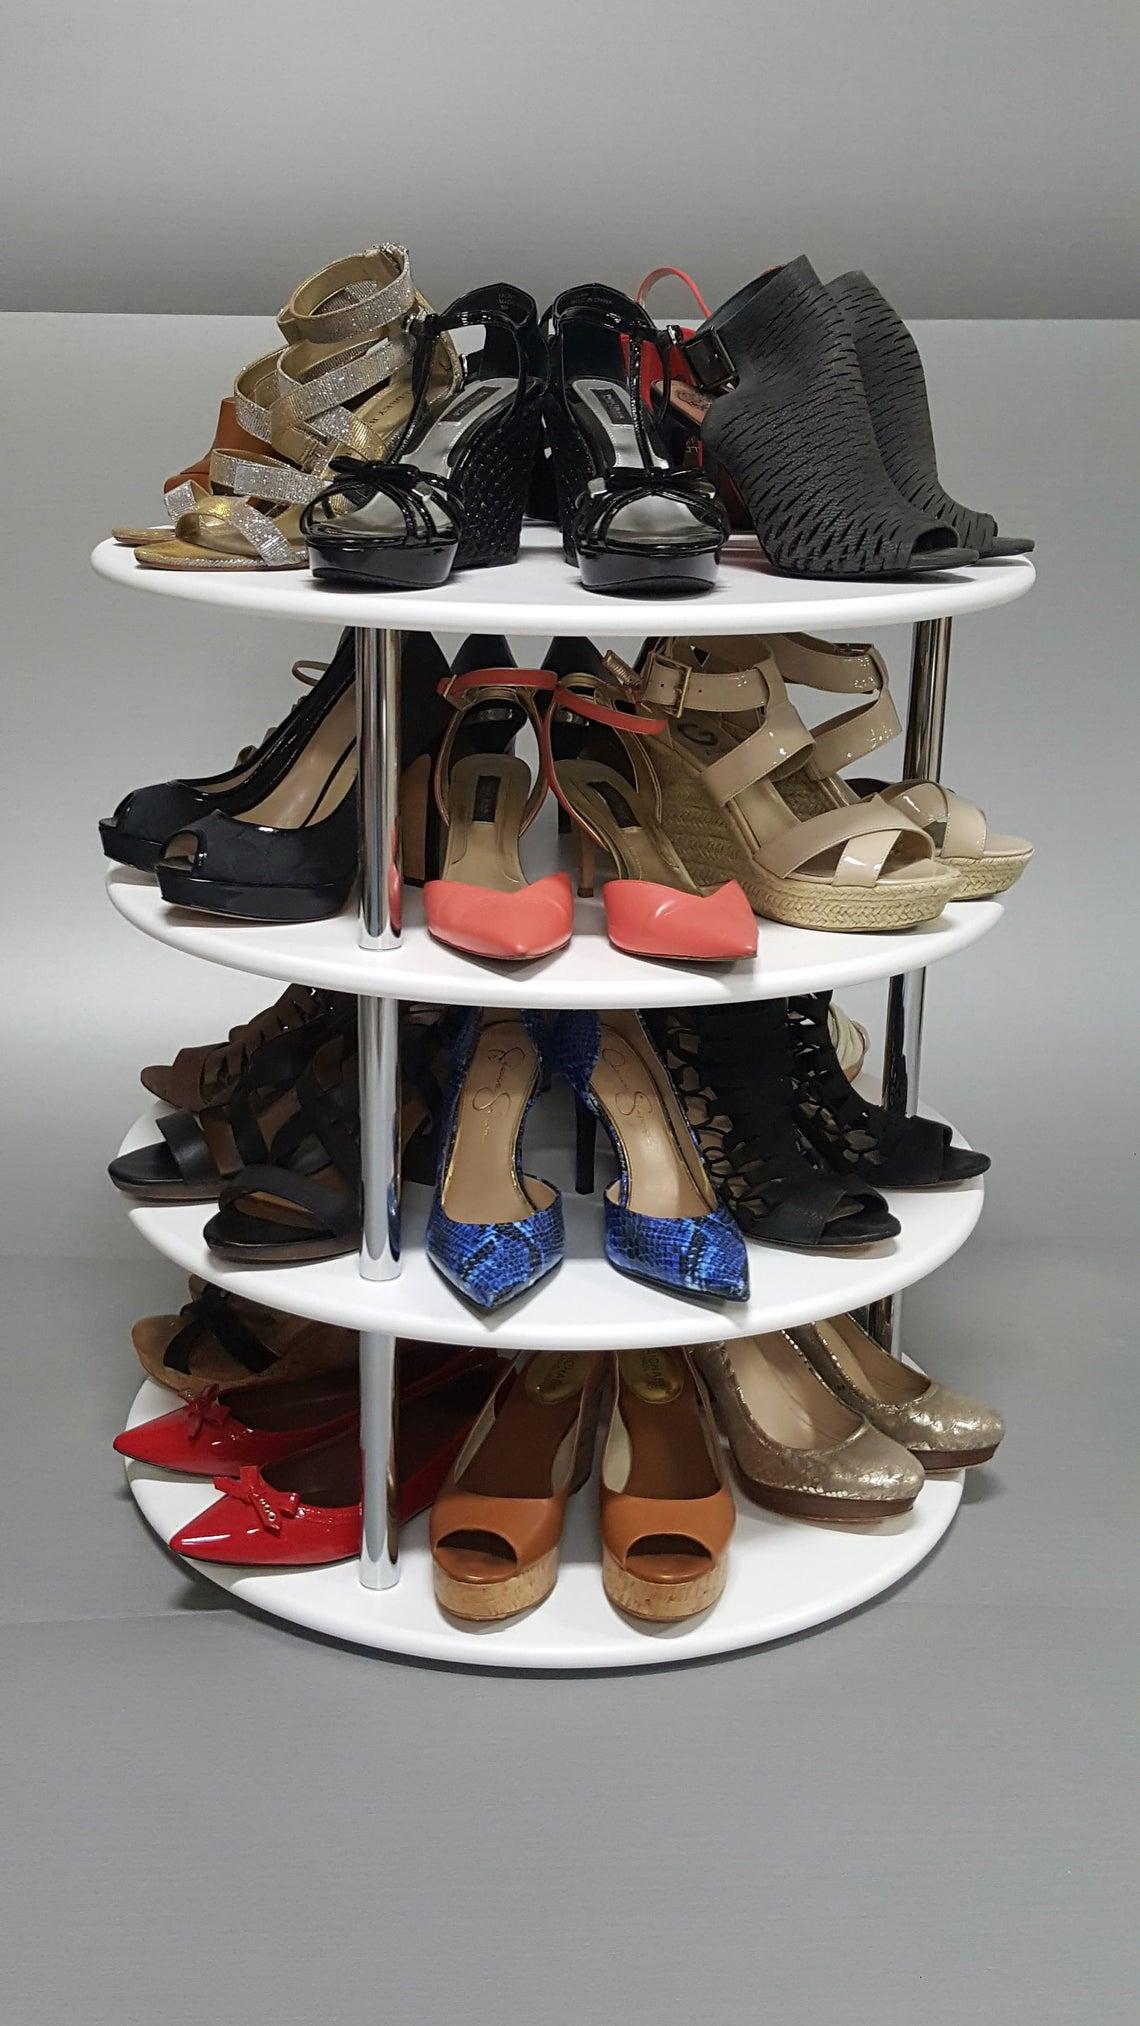 Rotating shoe shelf with shoes